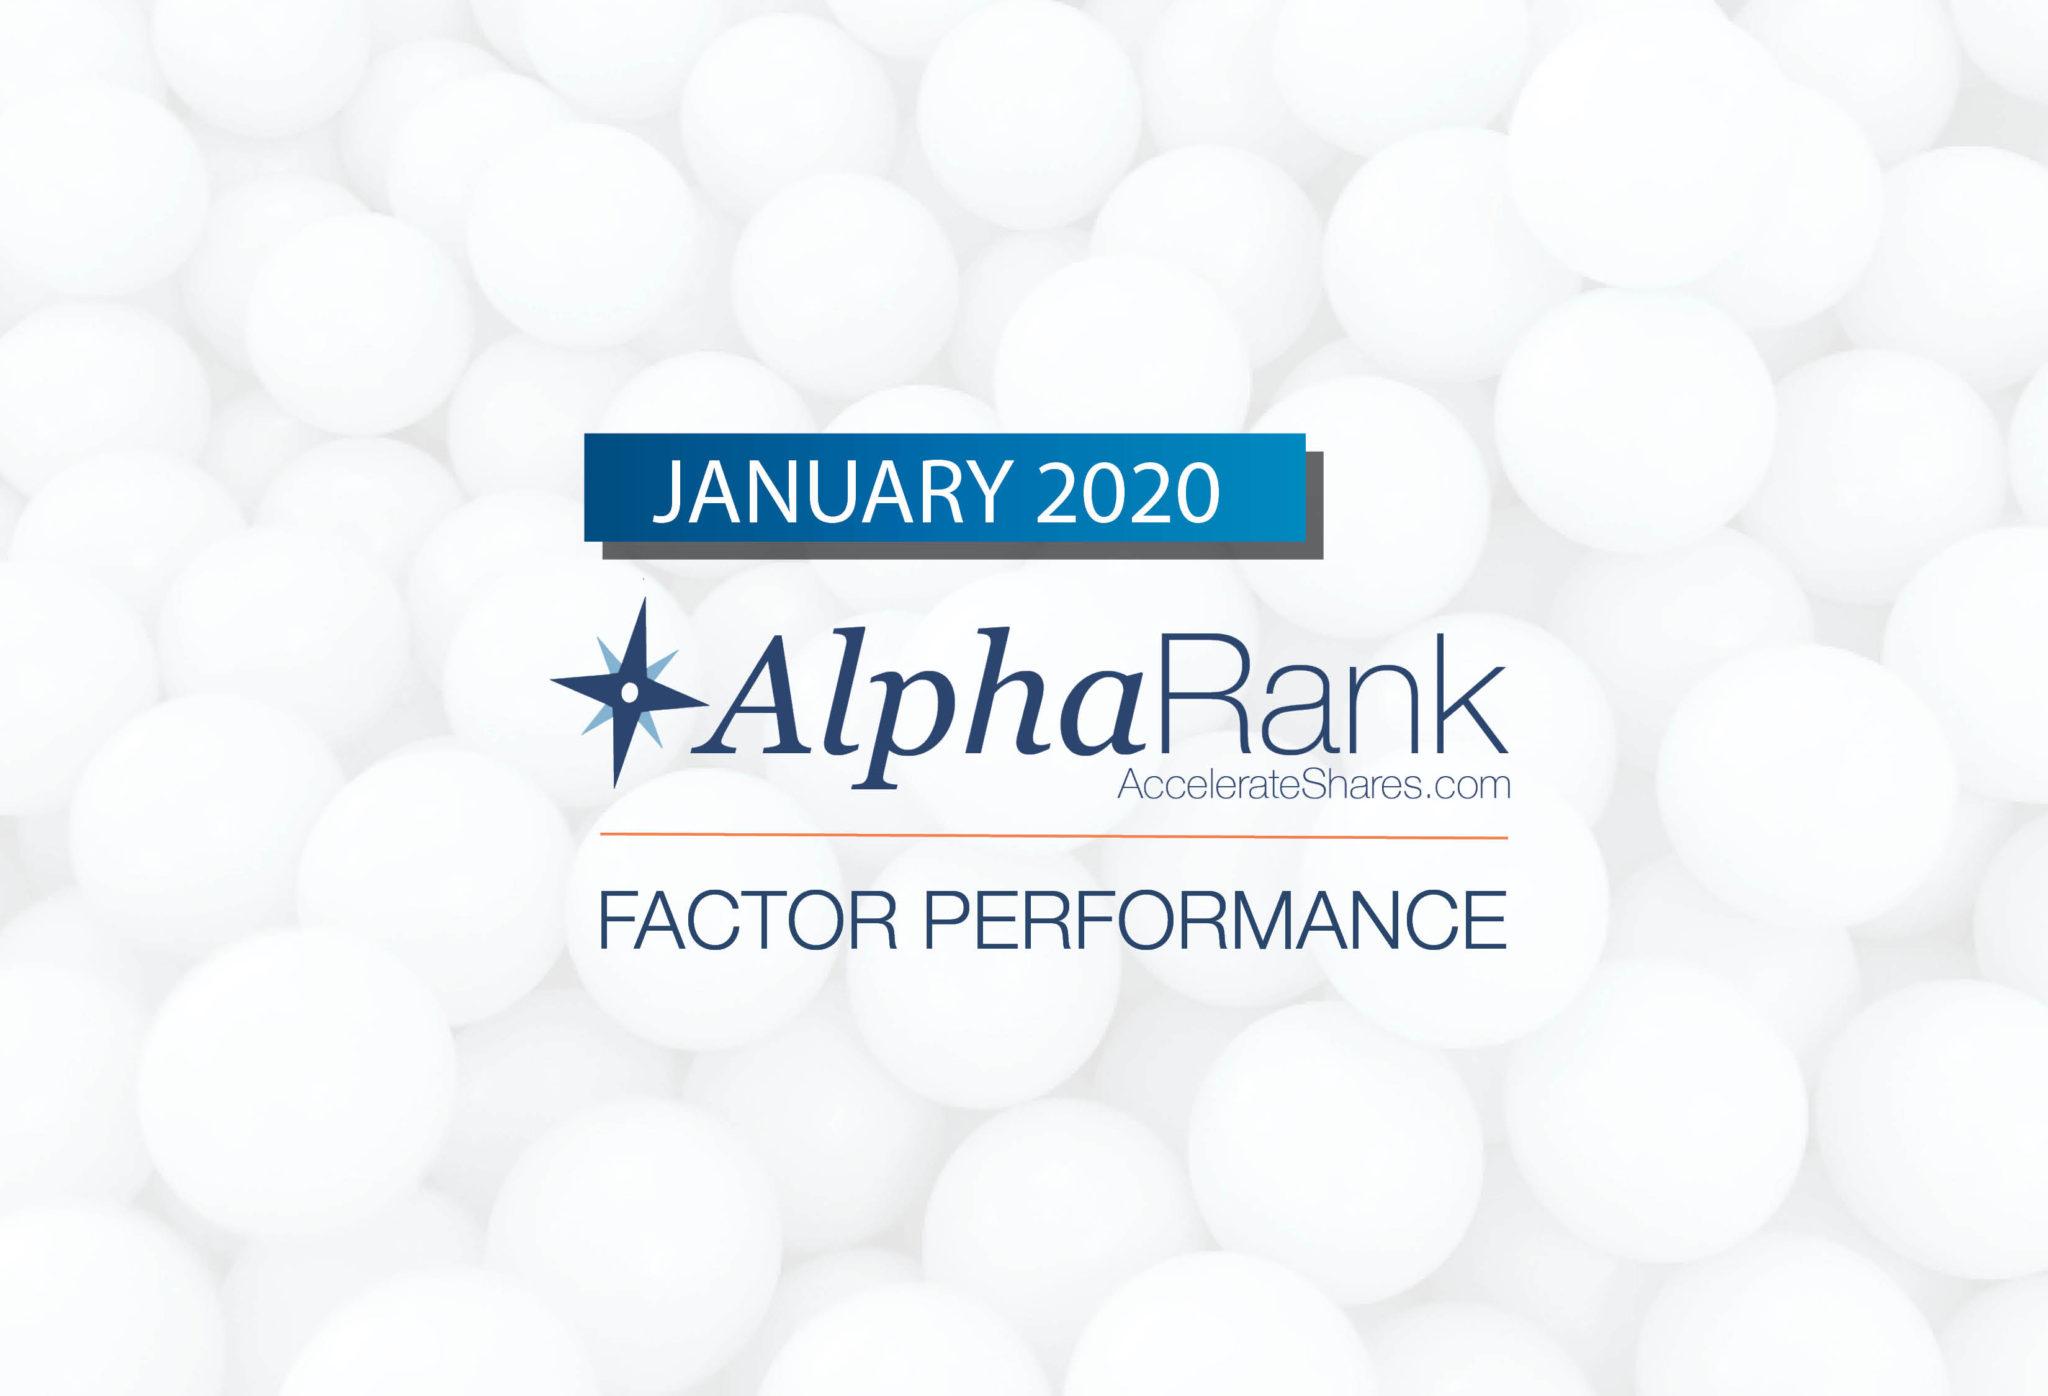 AlphaRank Factor Performance—January 2020